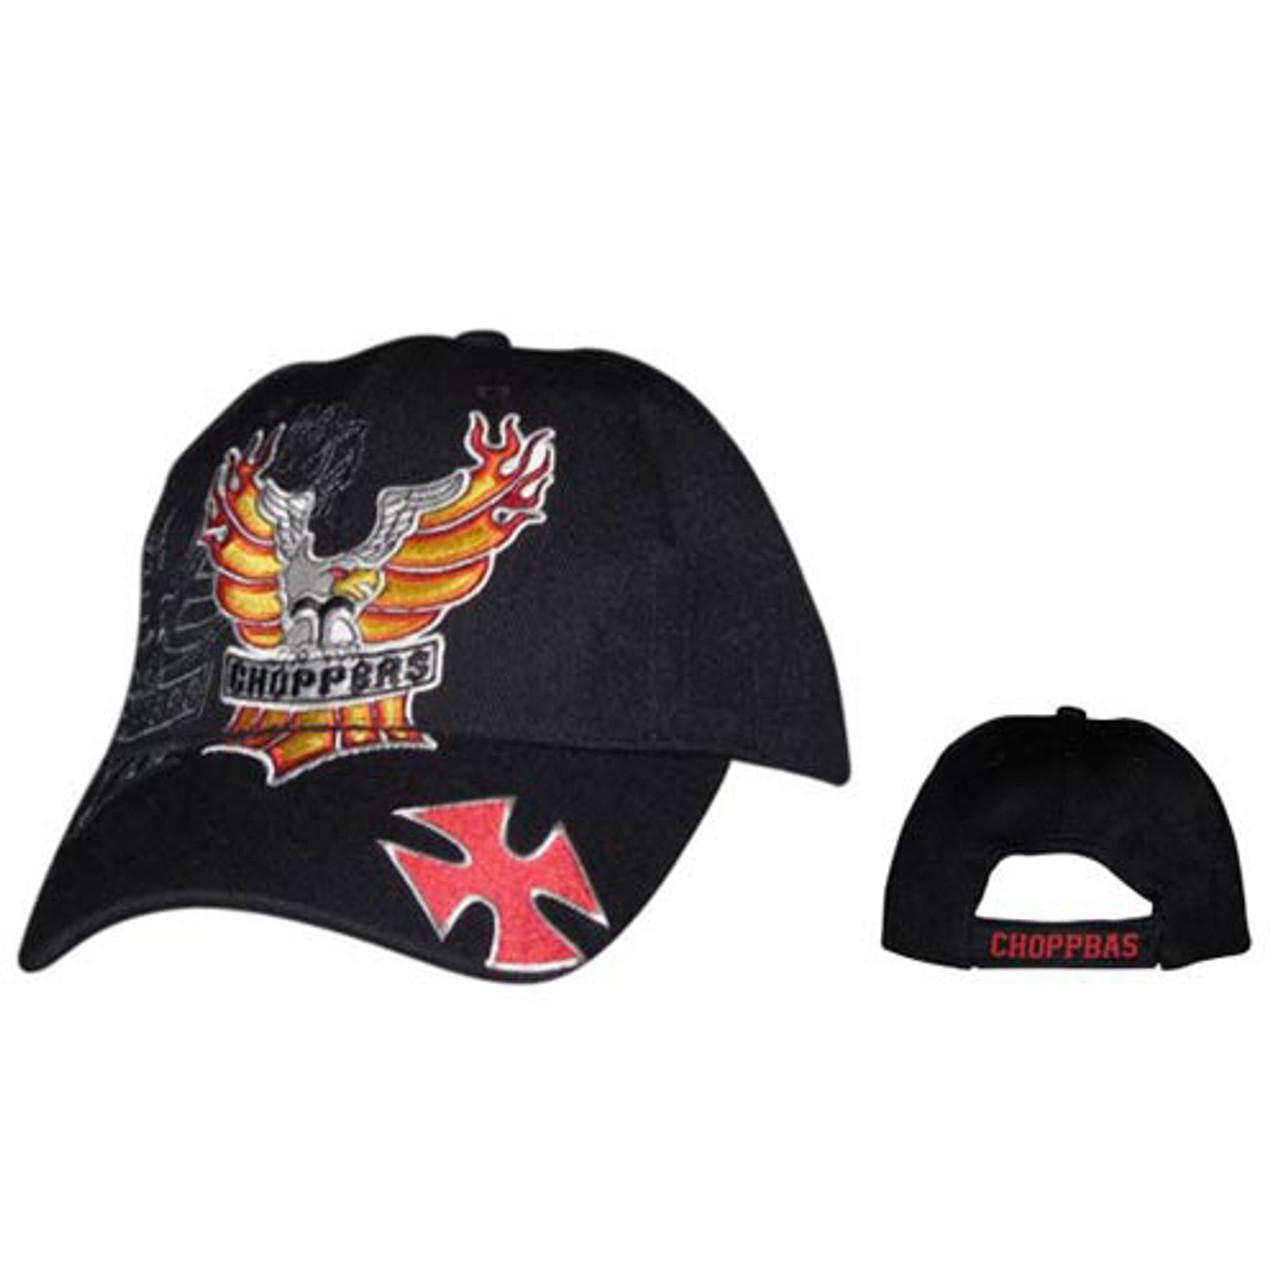 """Choppers"" Wholesale Baseball Cap"